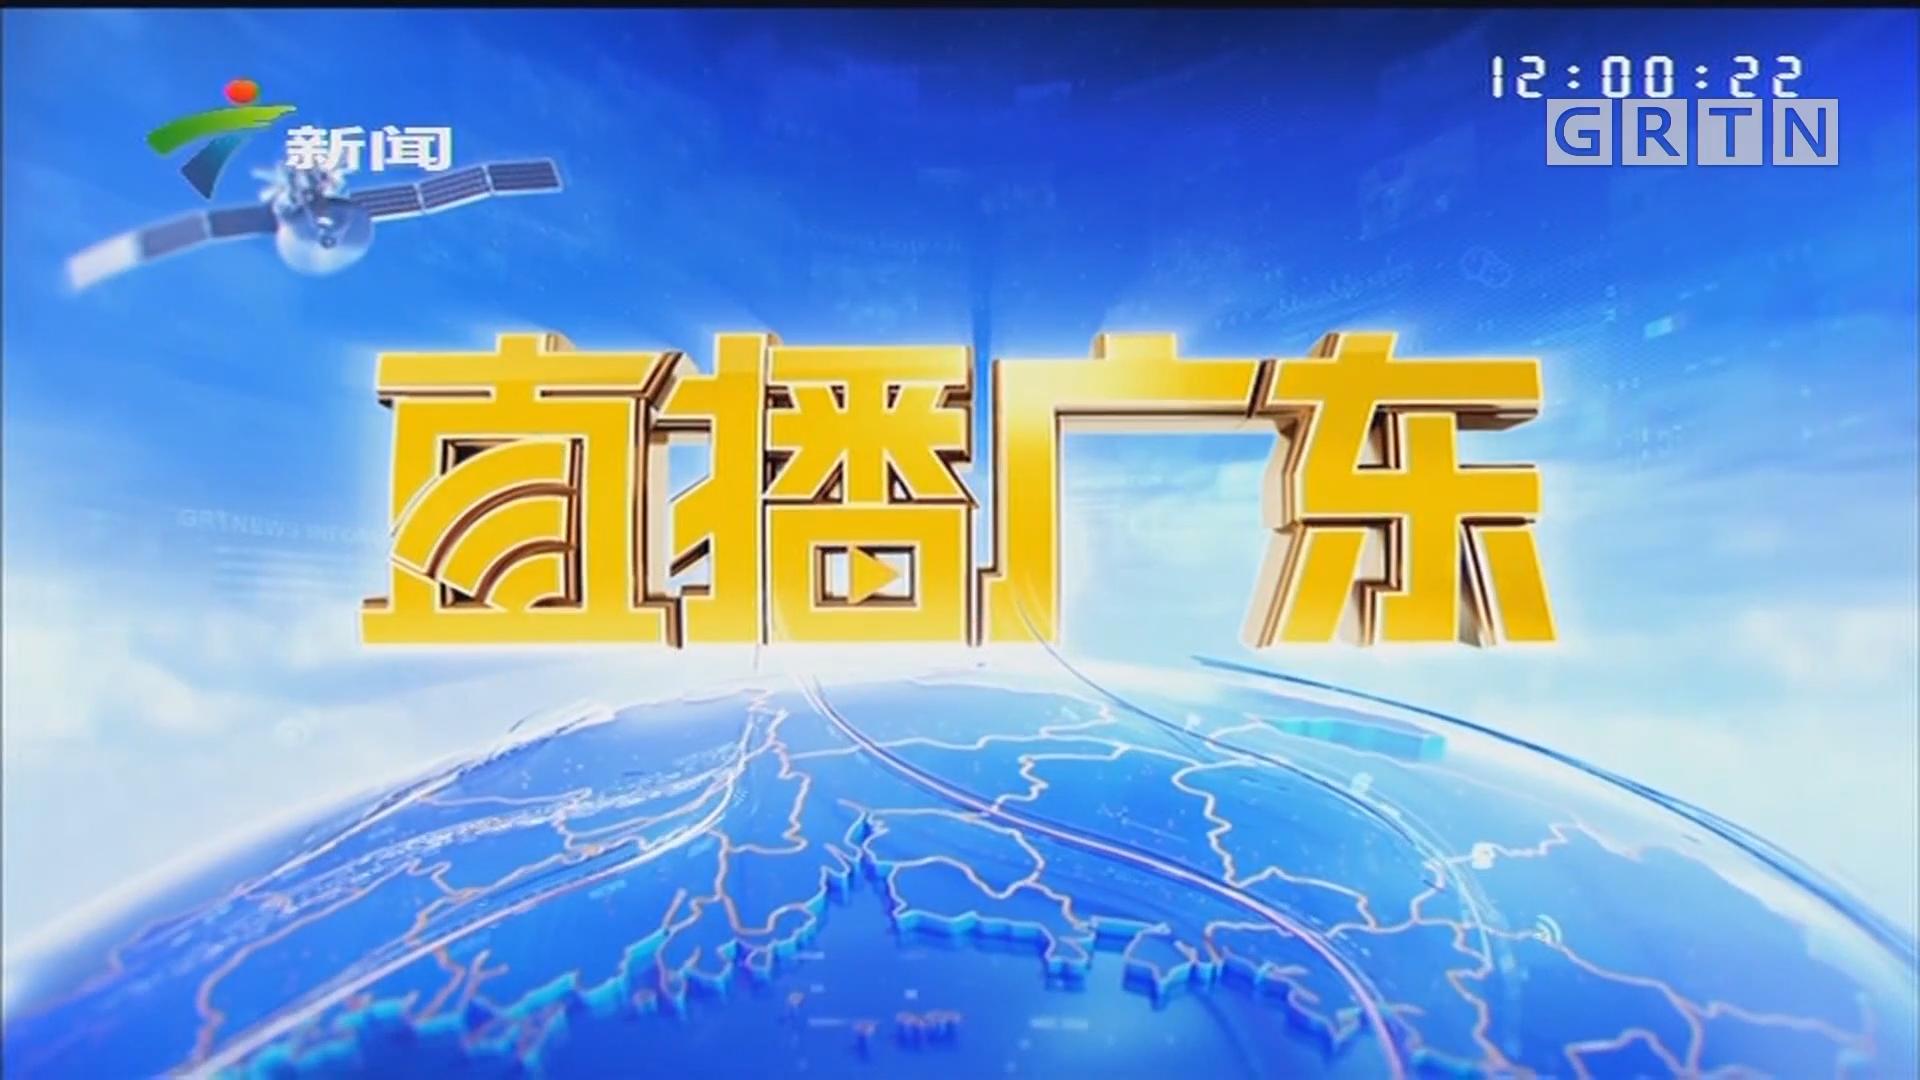 [HD][2019-06-16]直播广东:河源紫金桥坍塌救助最新进展:发现落水车辆 打捞准备工作正在进行